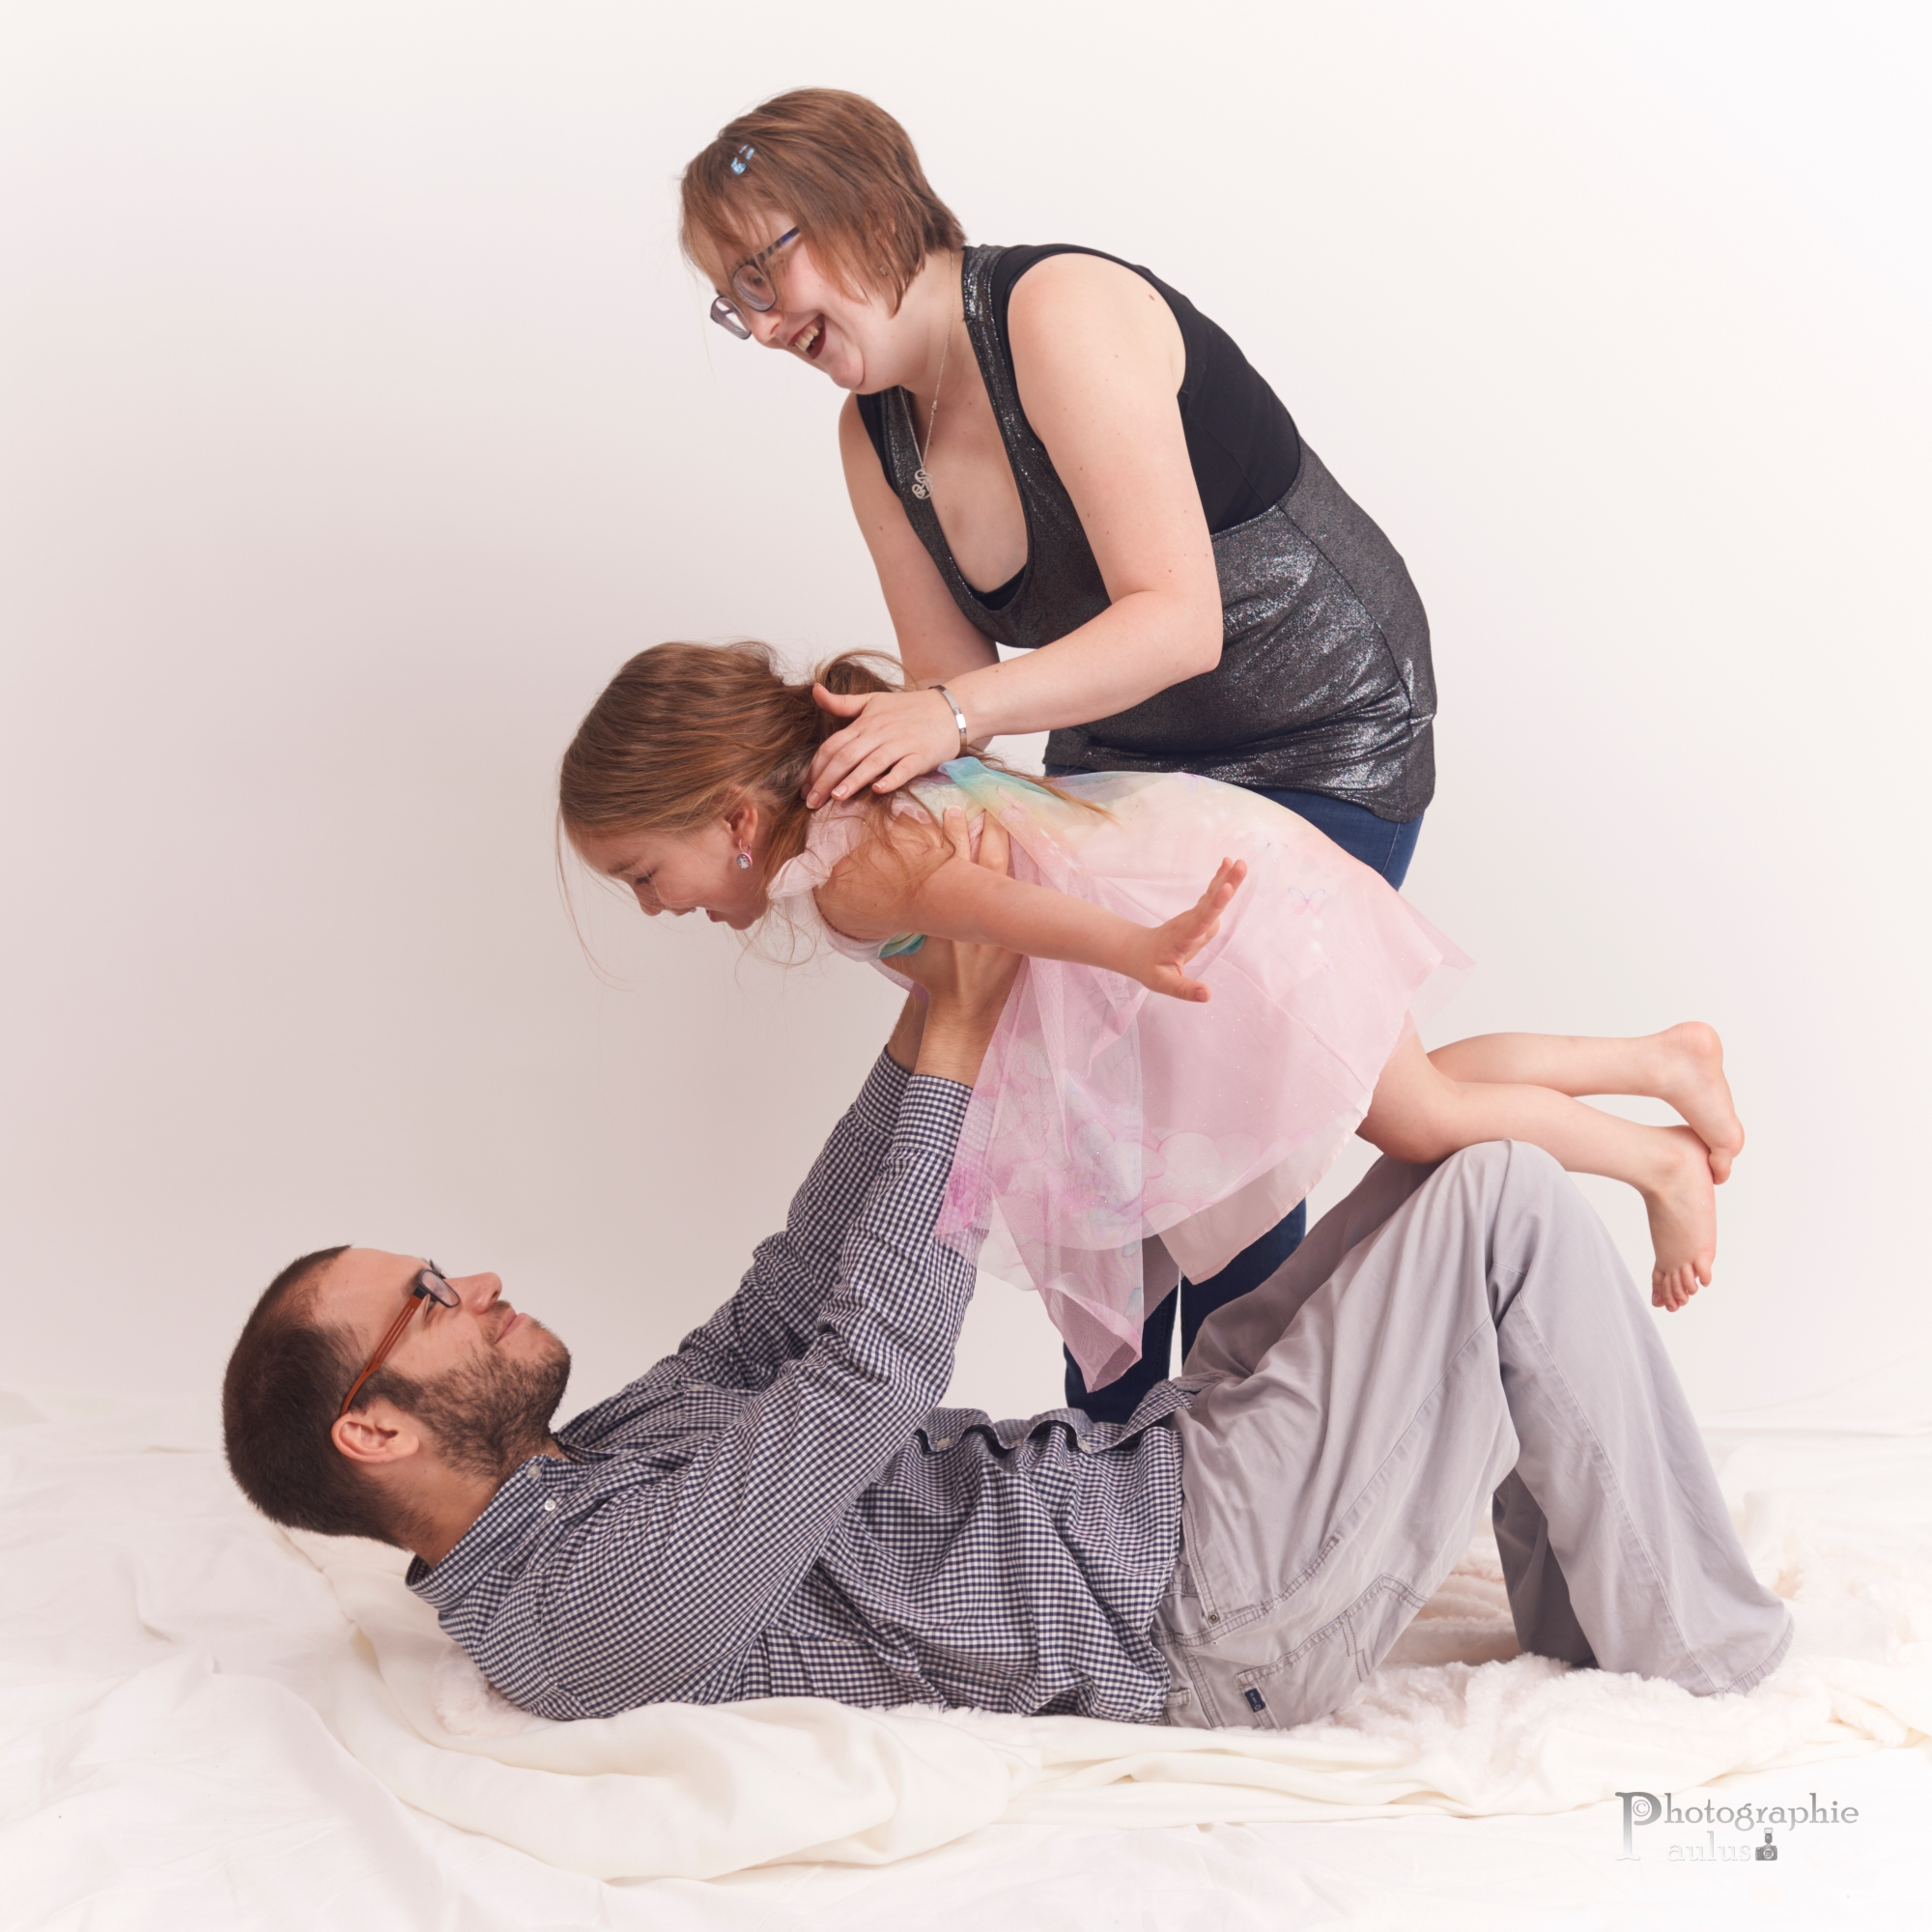 Famille Hodiaumont0351